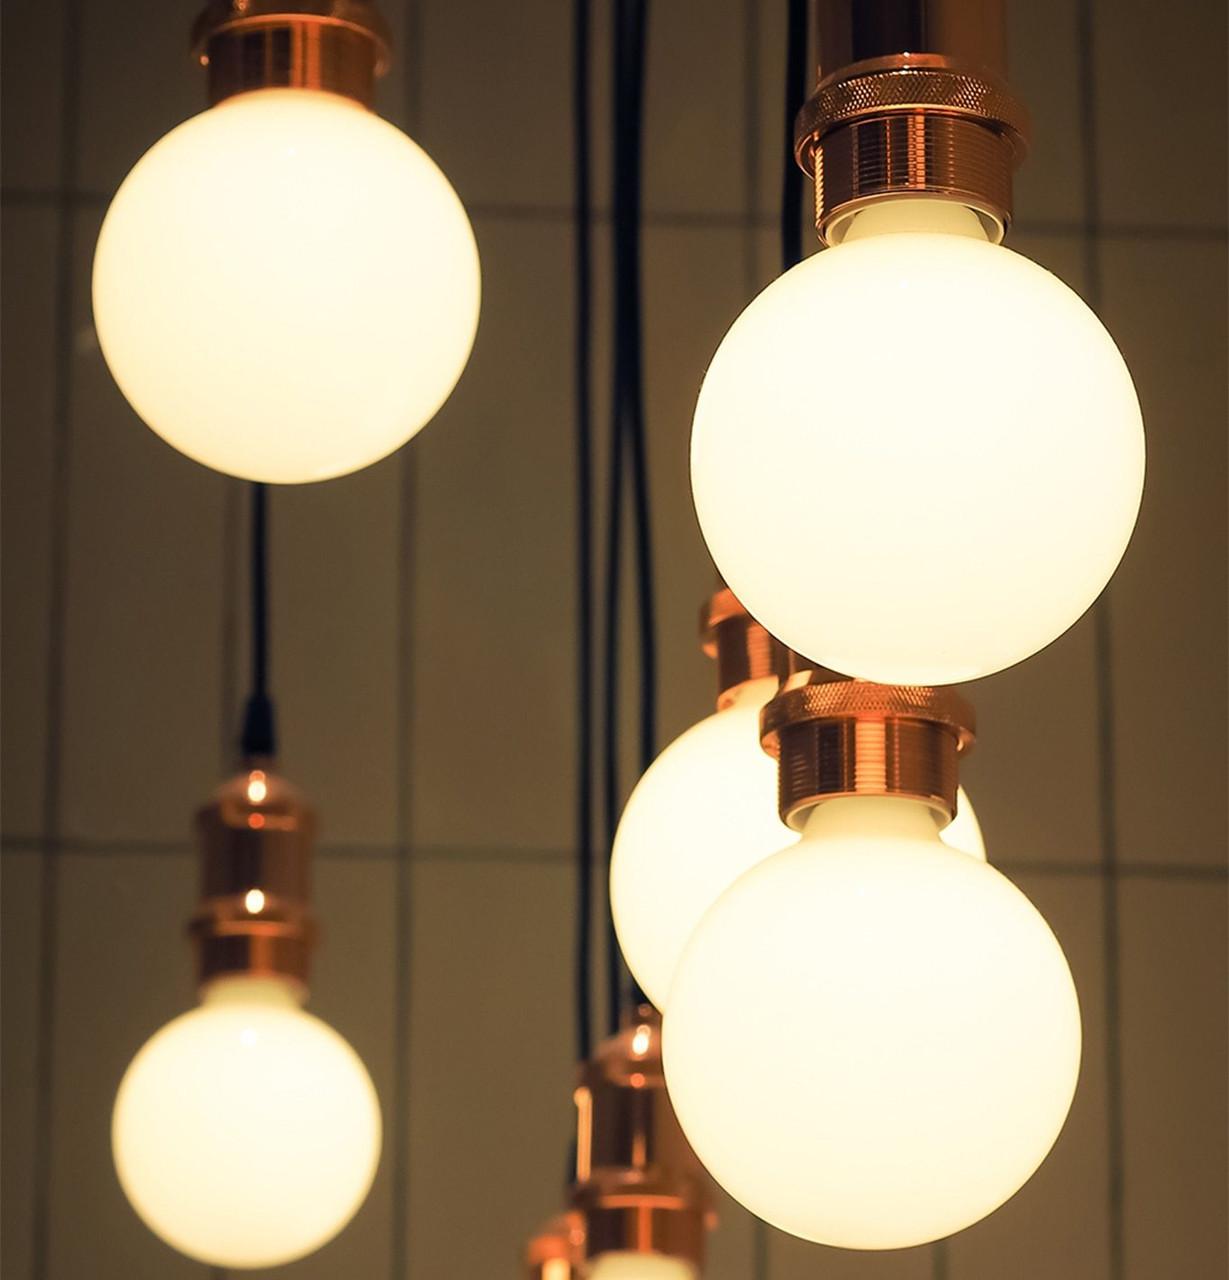 Crompton Lamps LED Globe 2700K Light Bulbs